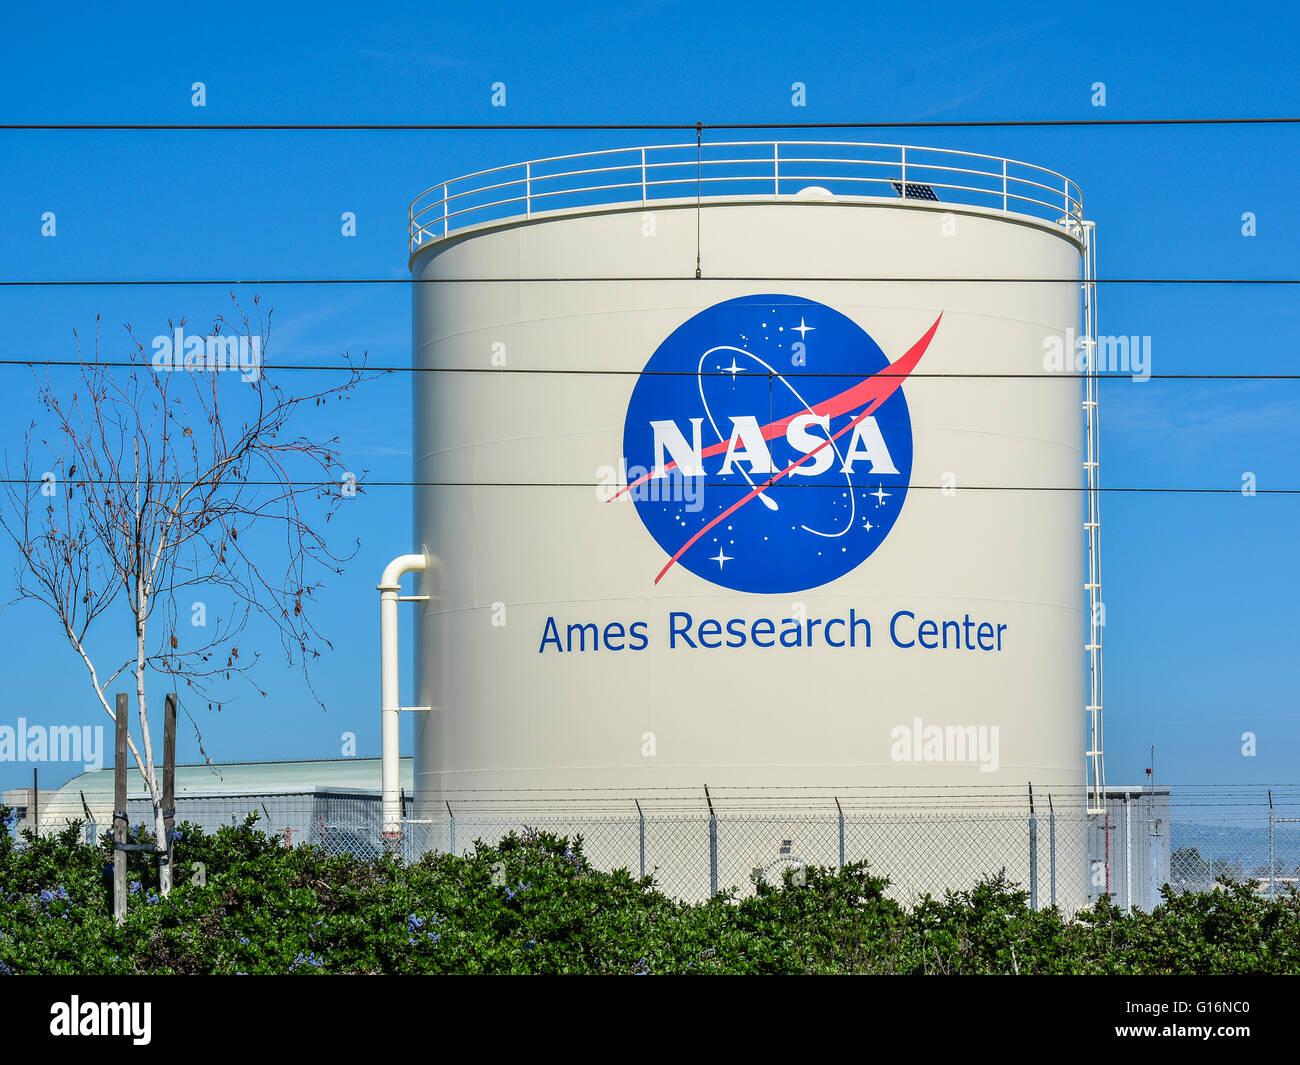 NASA Ames Research Center - Mountain View, CA, USA - Stock Image